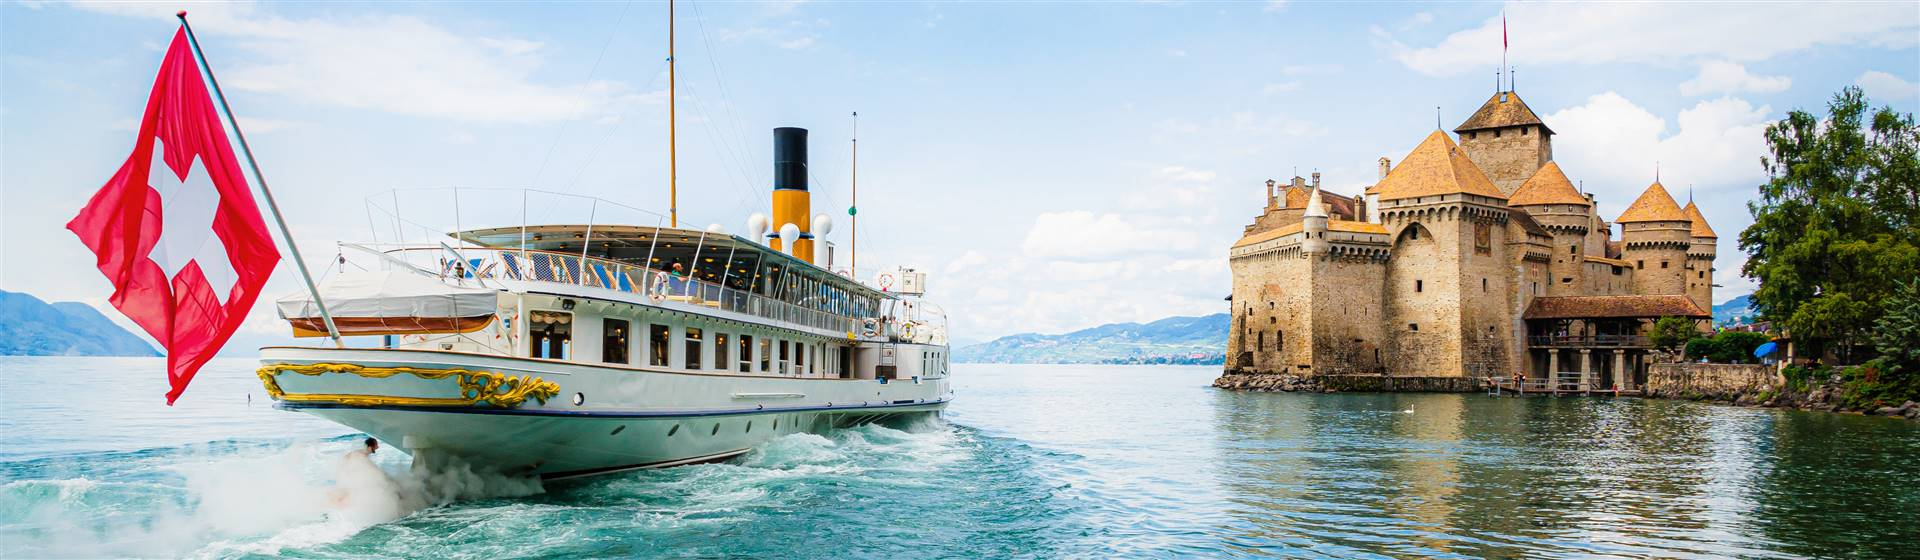 "<img src=""chateau_chillon©shutterstock.jpeg"" alt=""Lake Geneva & Château Chillon""/>"